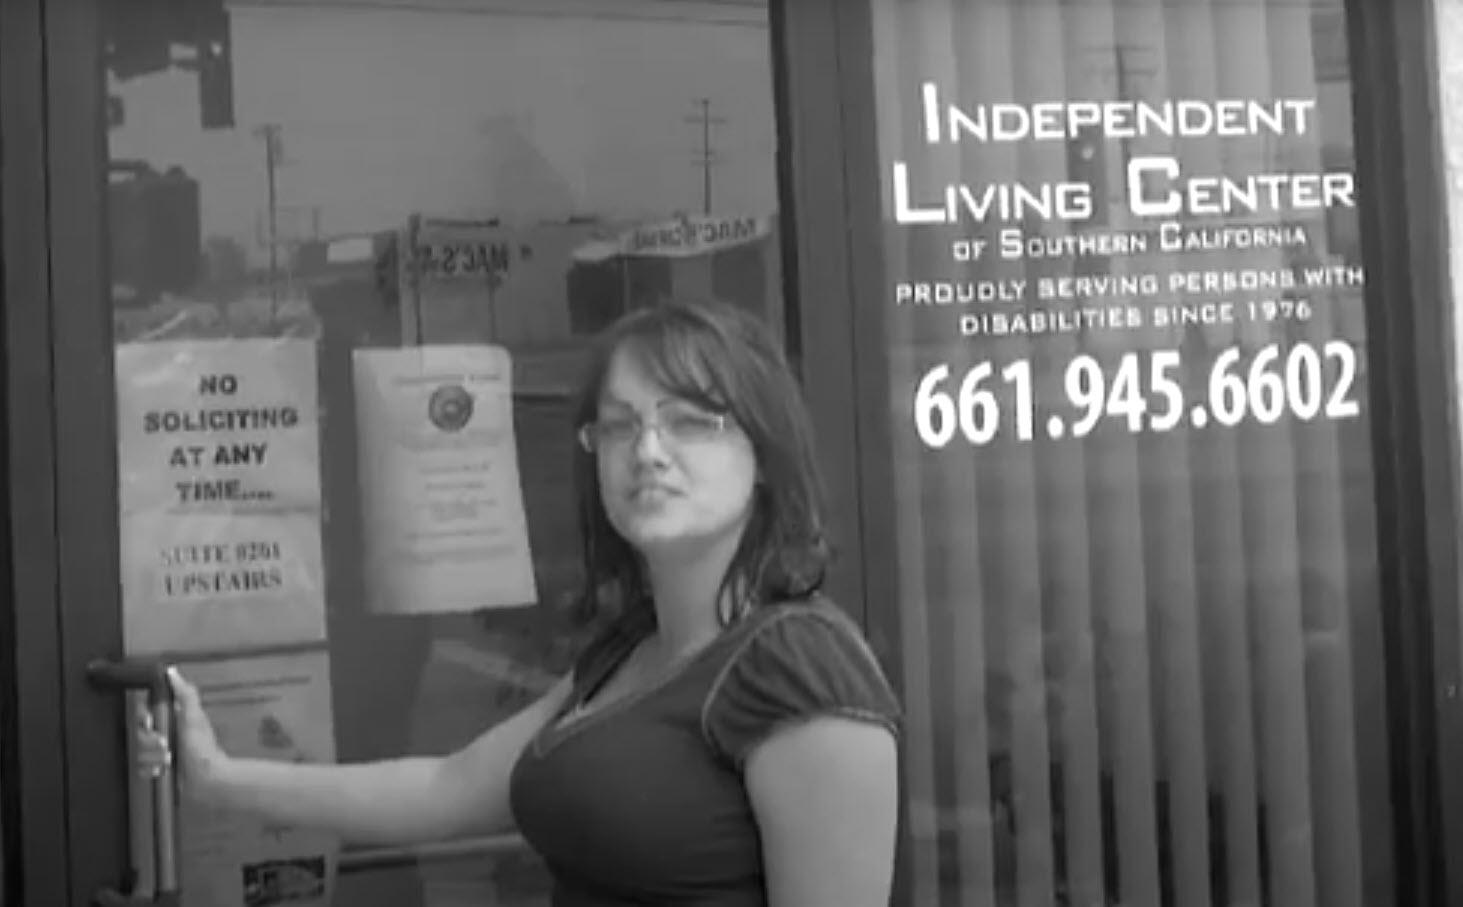 Woman entering Lancaster office of ILCSC